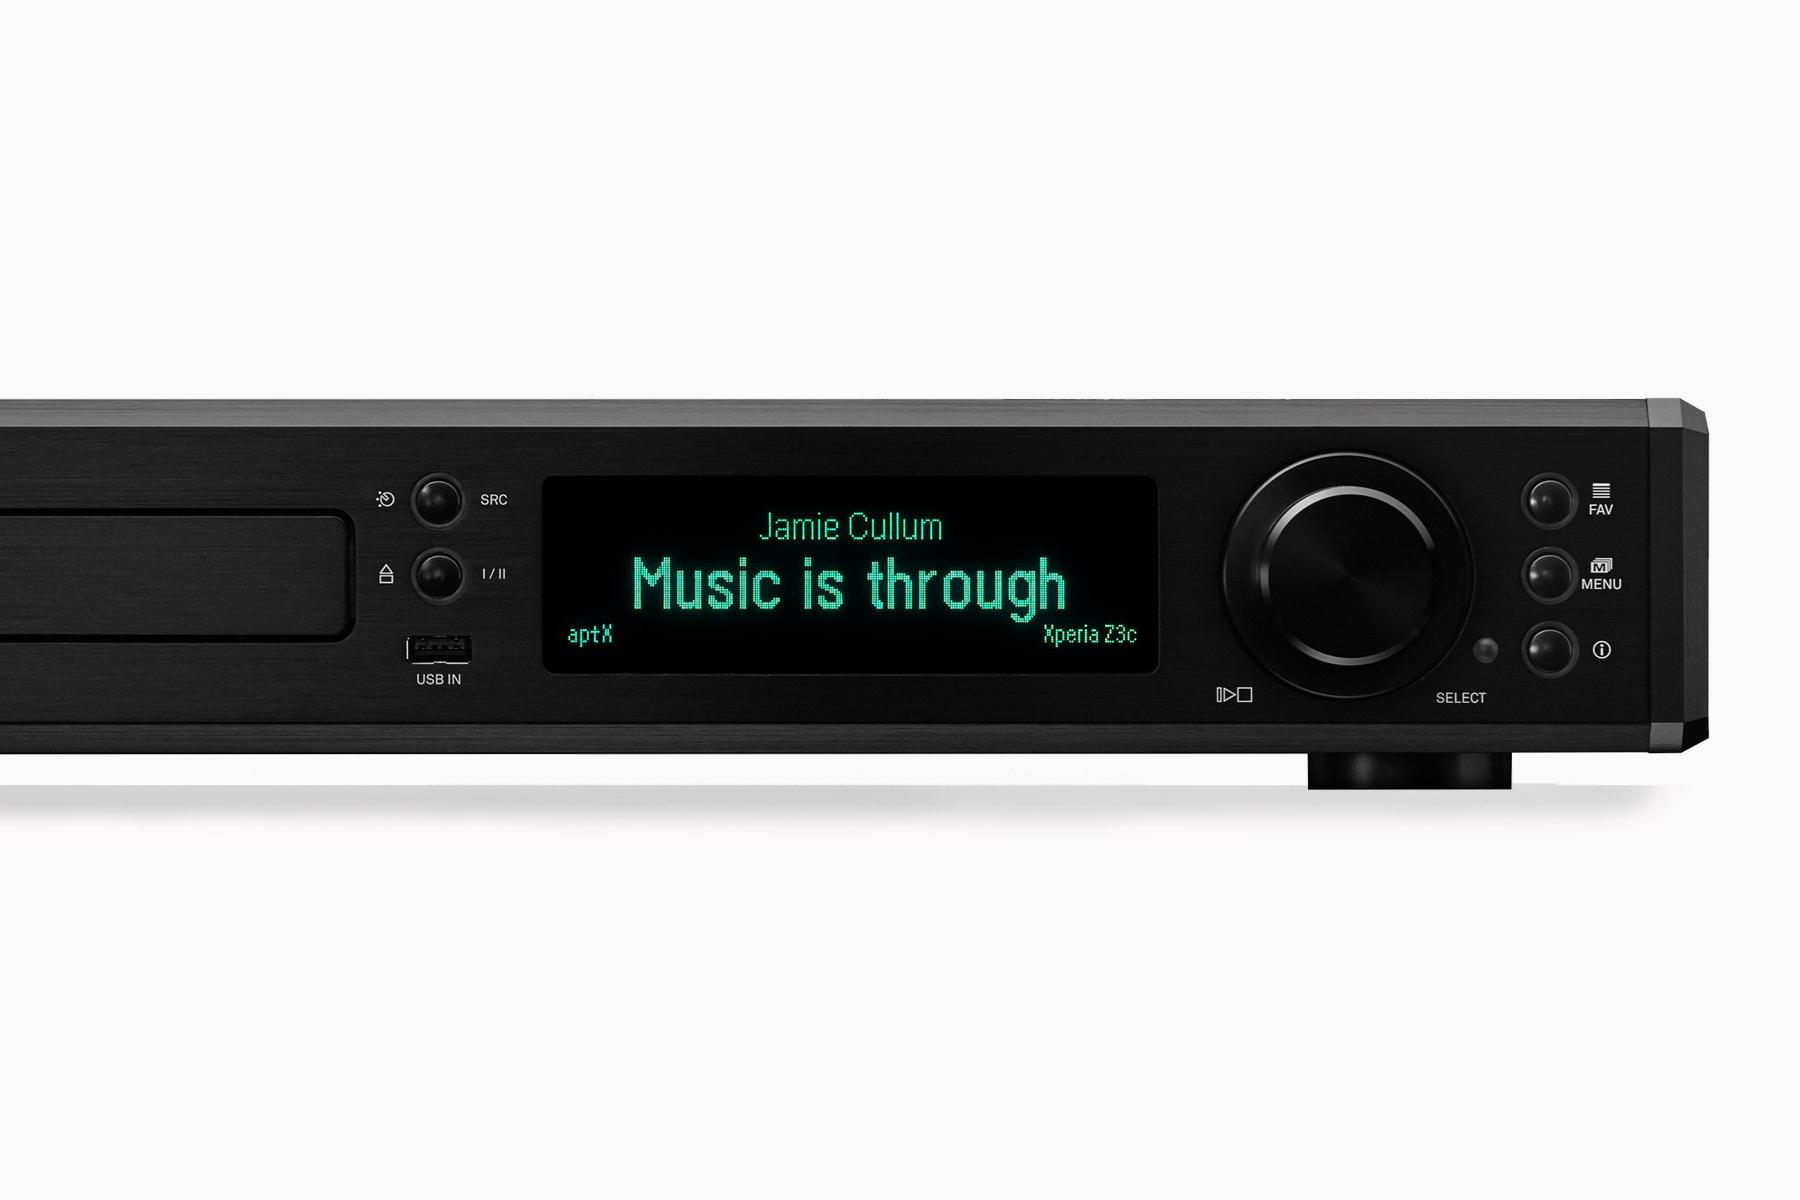 Mp 2000 R Mkii Multi Source Player Circuit Board Manufacturefm Radio Mp3